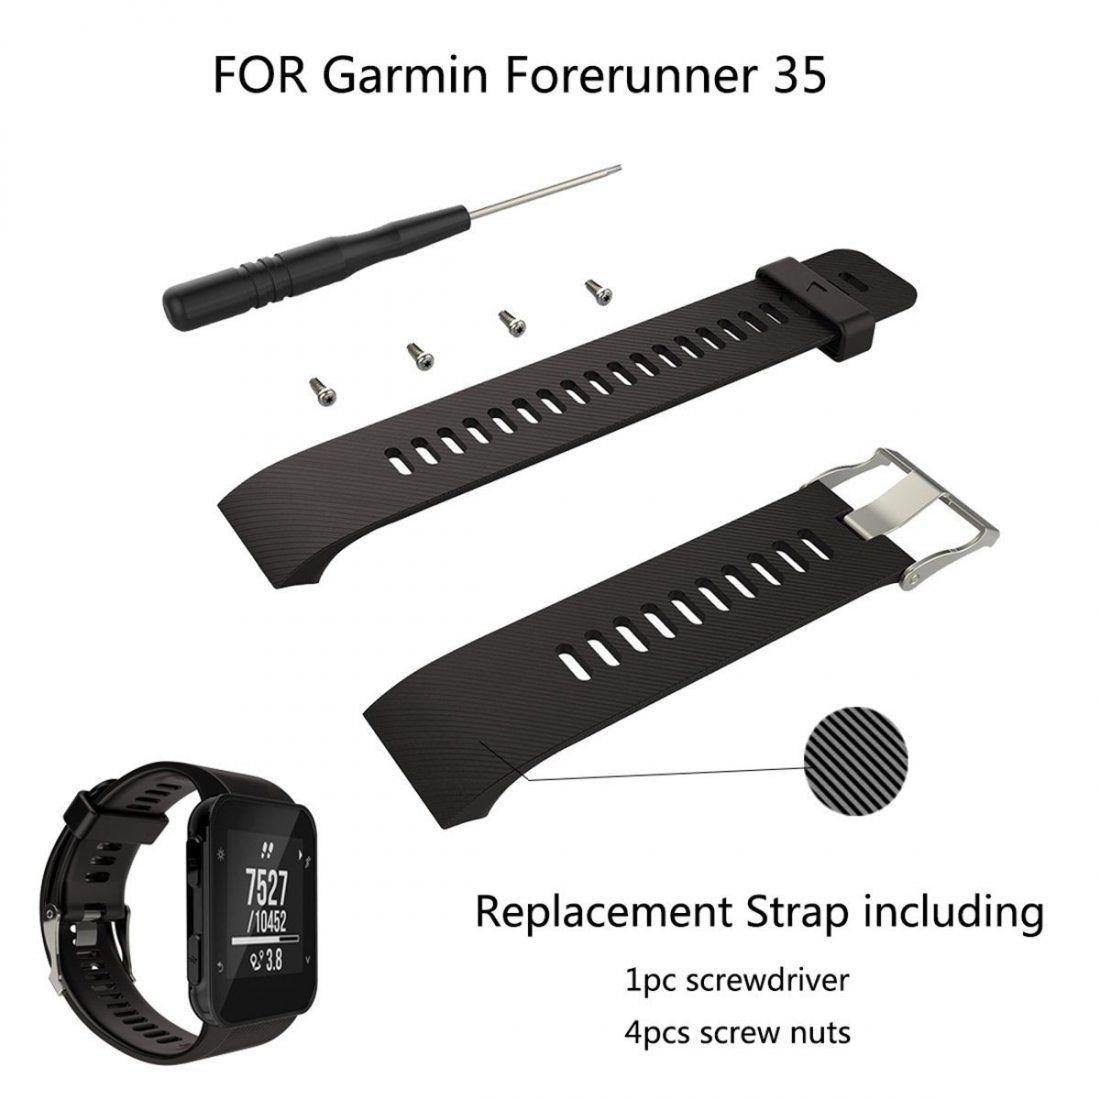 YEFOD Garmin Forerunner 35 Bracelet, Silicone Remplacement Accessoire Bande Bracelet de Montre pour Garmin Forerunner 35